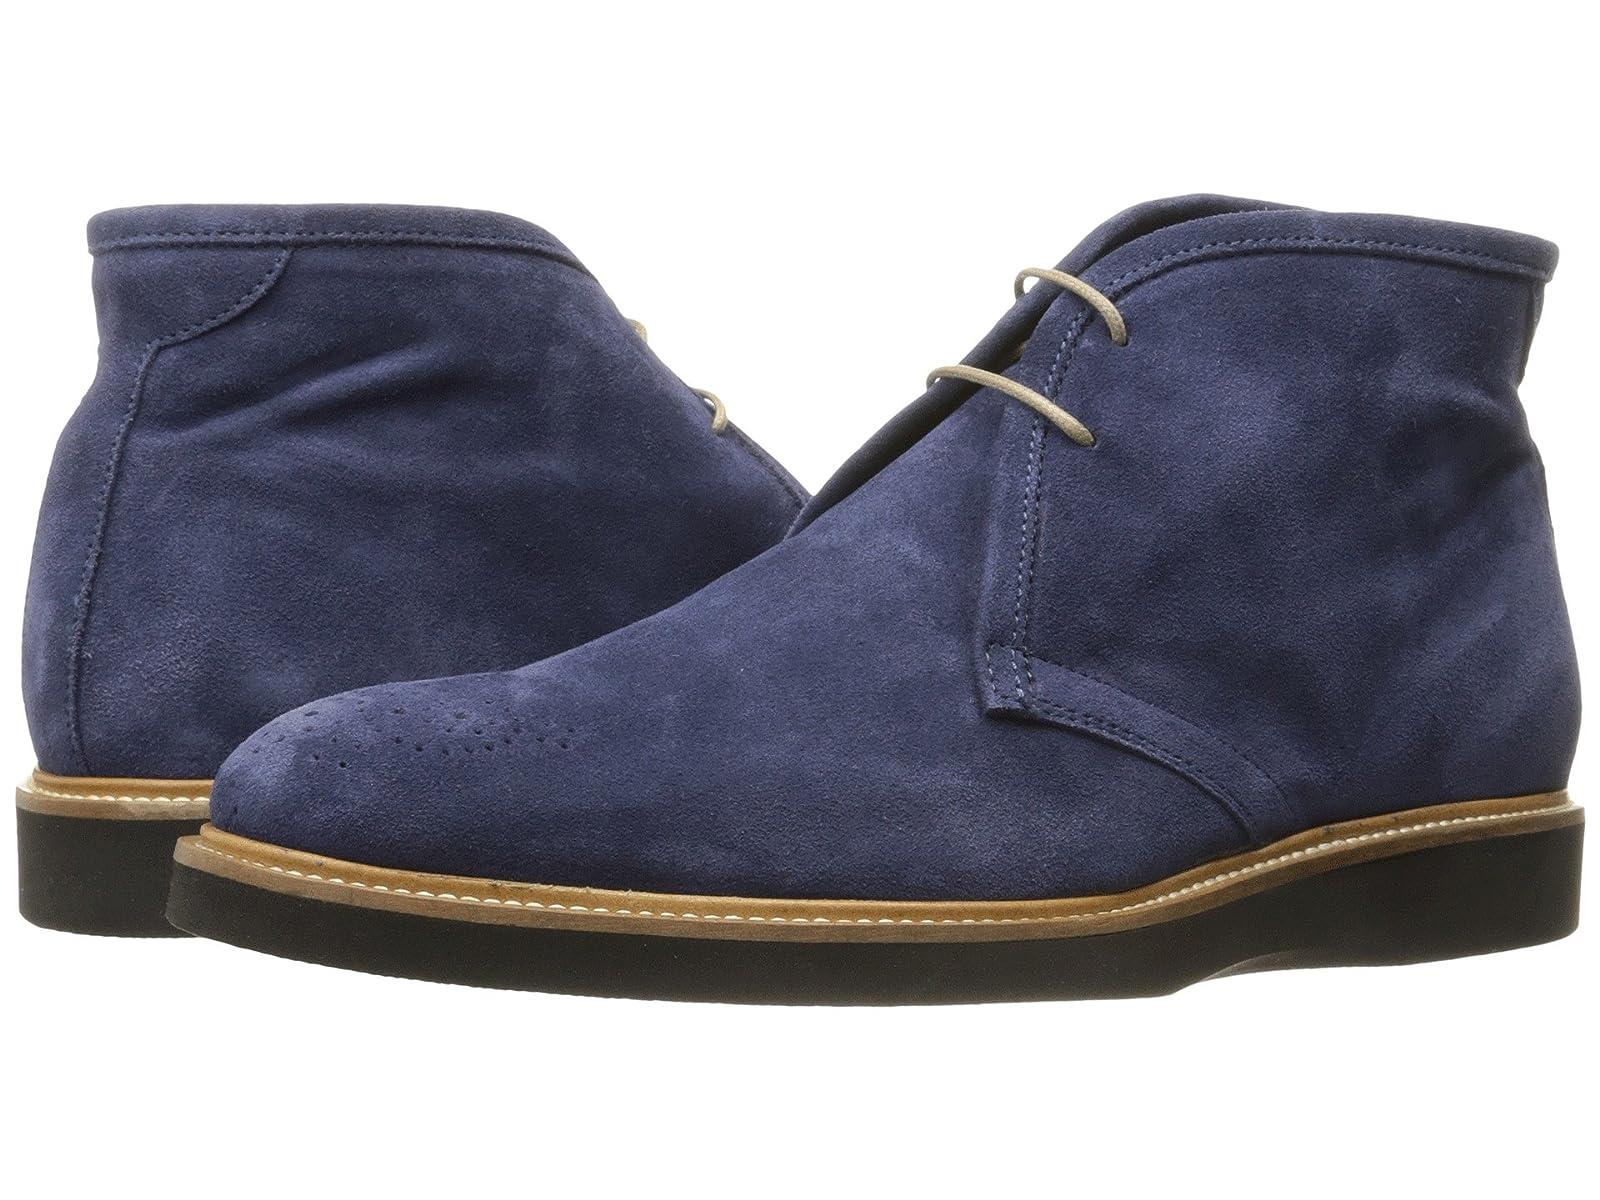 BUGATCHI San Gimignano BootCheap and distinctive eye-catching shoes